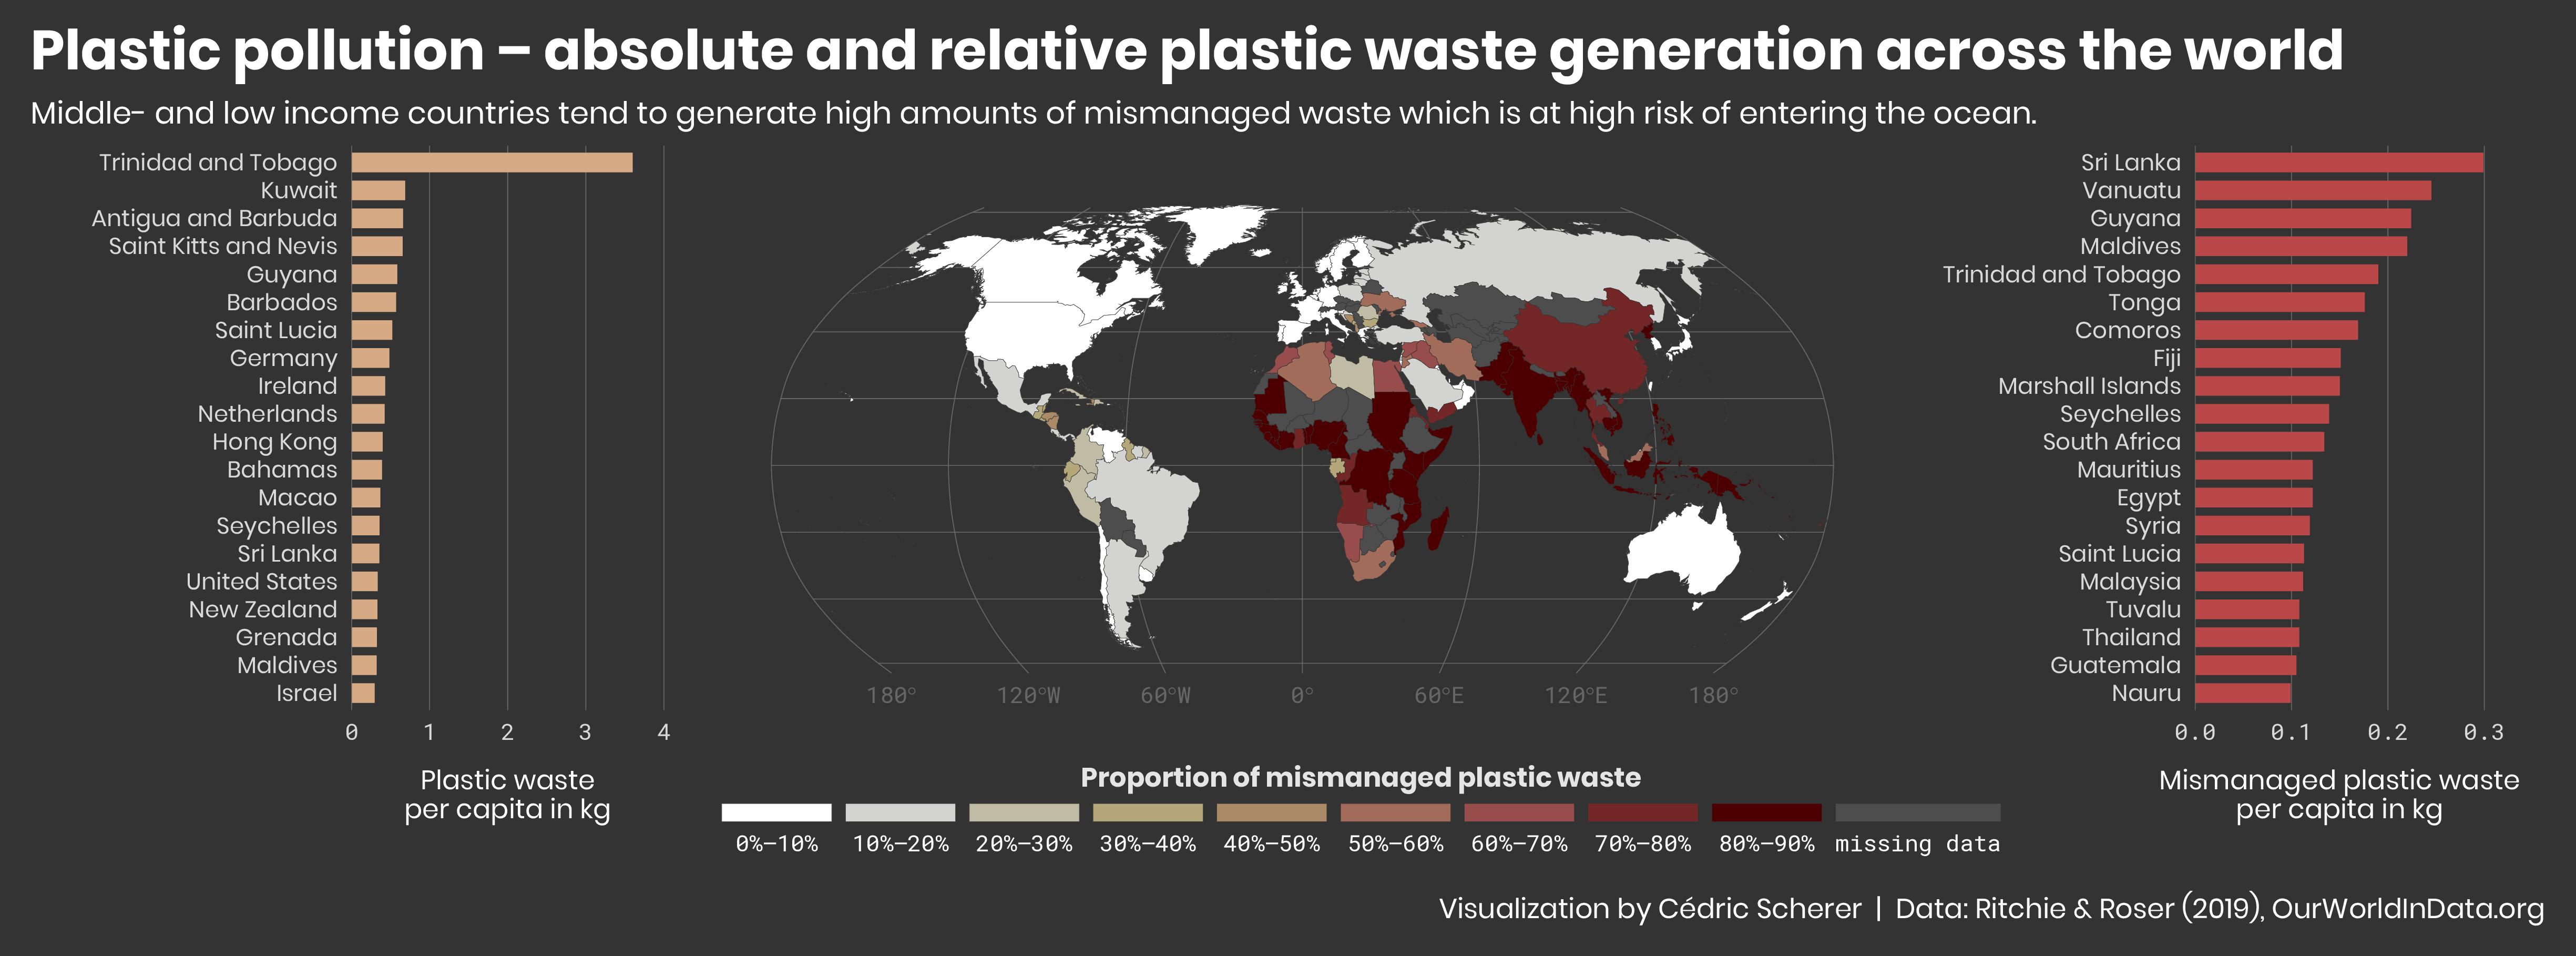 ./plots/2019_21/2019_21_PlasticWaste.png